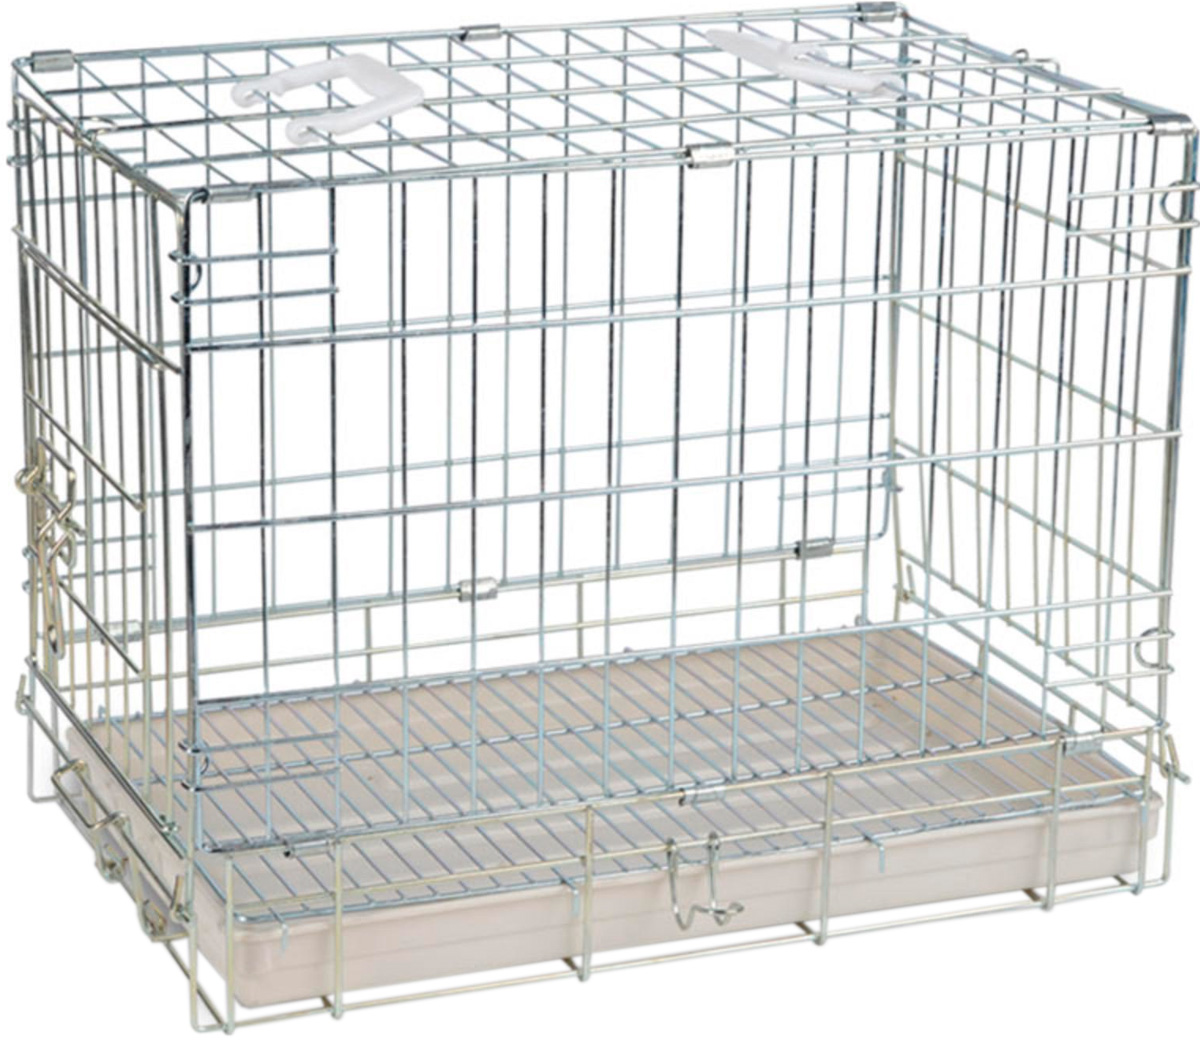 Клетка для животных Triol 003sc хром 77 х 56 х 64 см (1 шт) переноска для животных triol premium large 80 1 х 56 2 х 59 см 1 шт